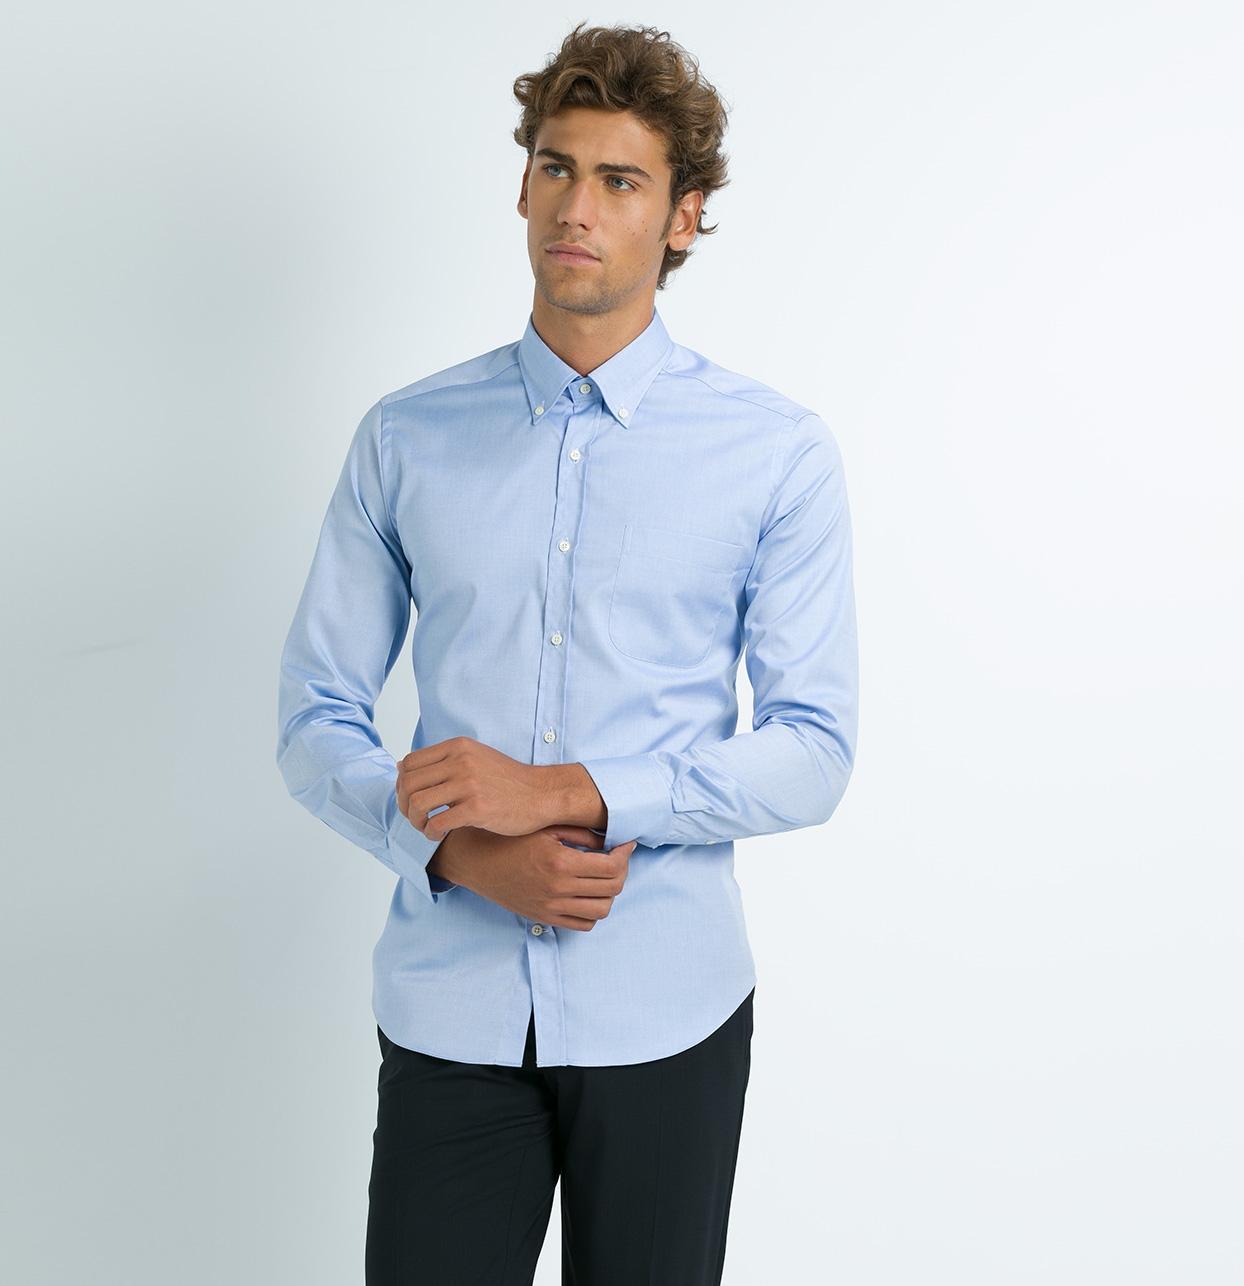 Camisa Formal Wear REGULAR FIT modelo BUTTON DOWN tejido rayas color azul,100% Algodón. - Ítem3